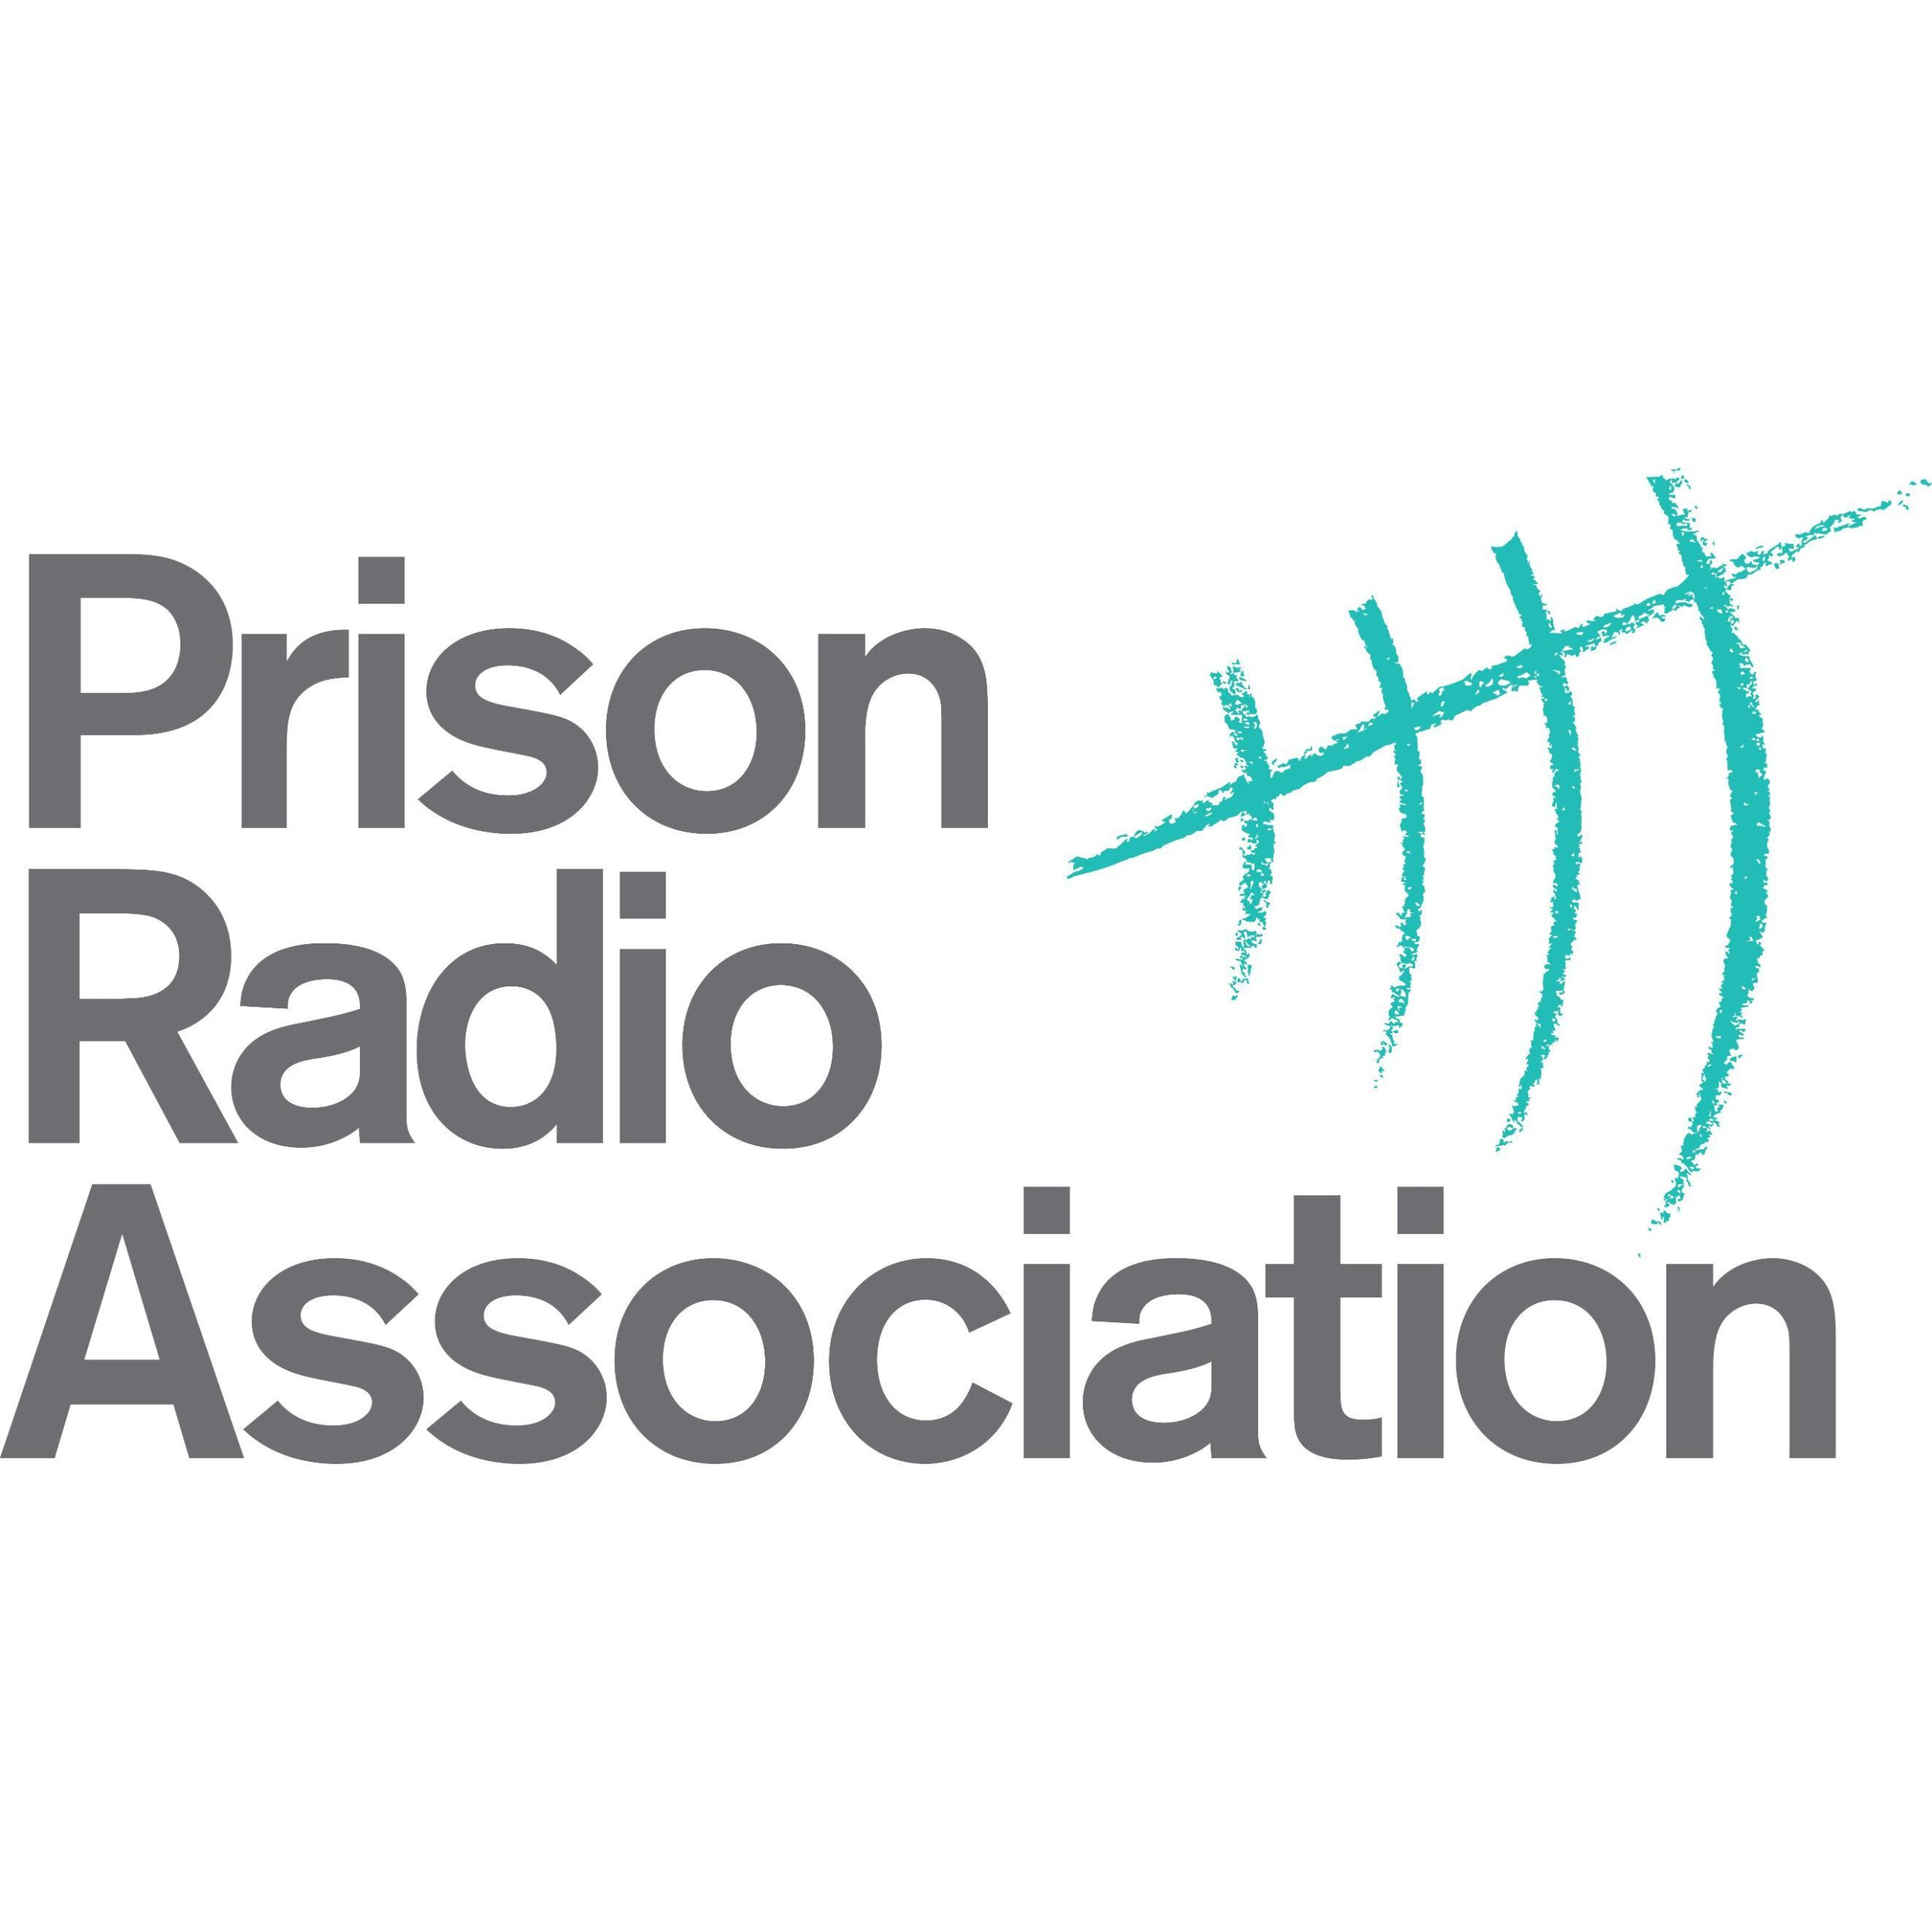 Prison Radio Association are hiring a producer